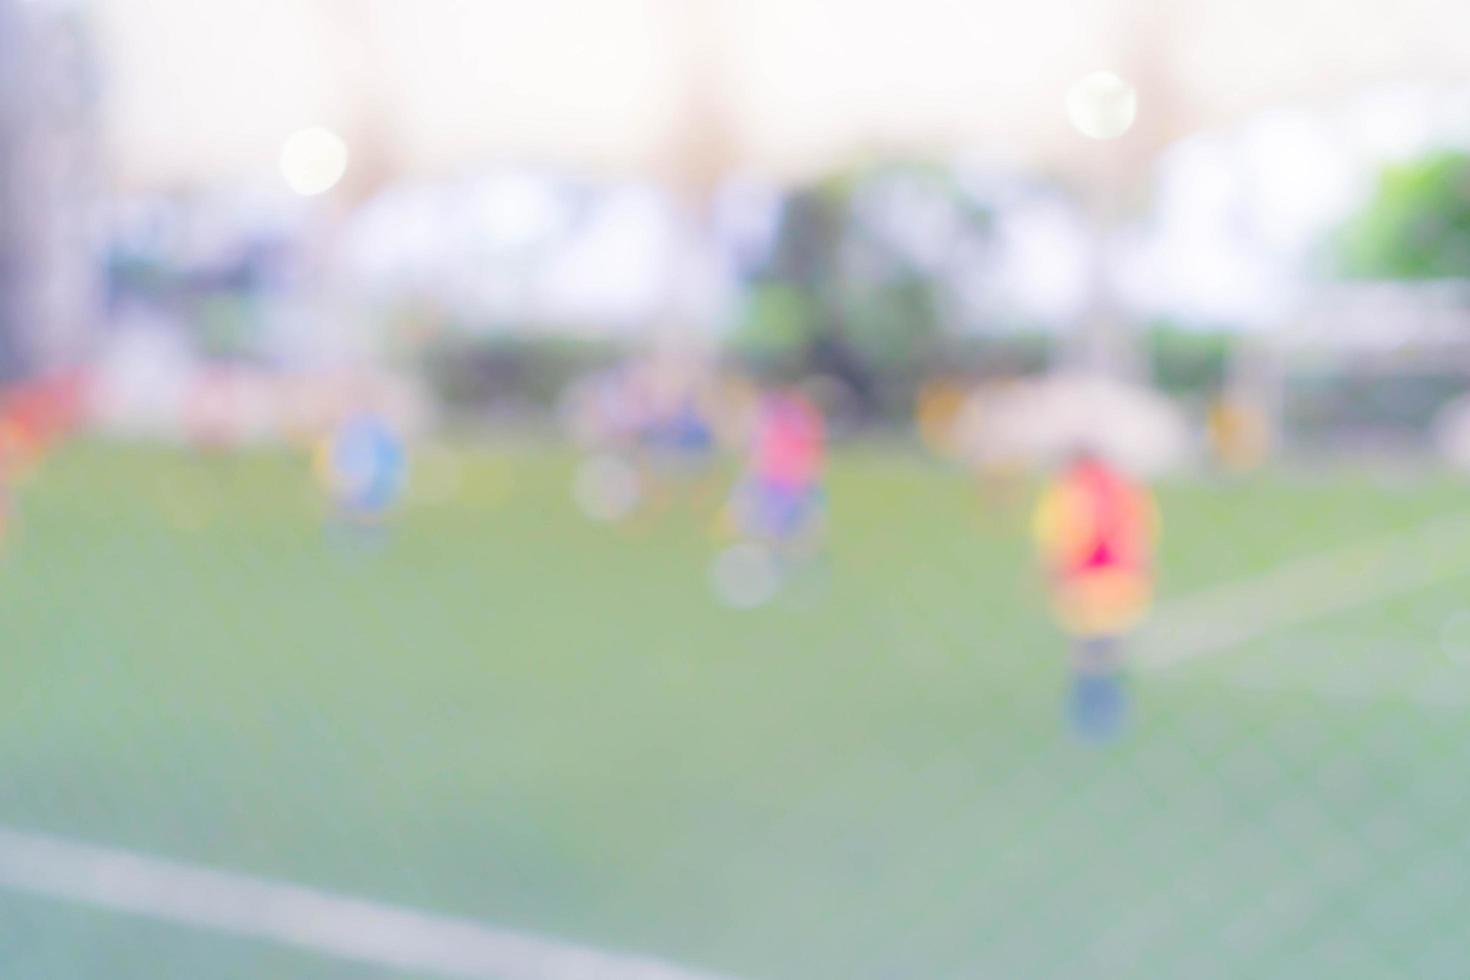 abstract wazig voetbalveld foto